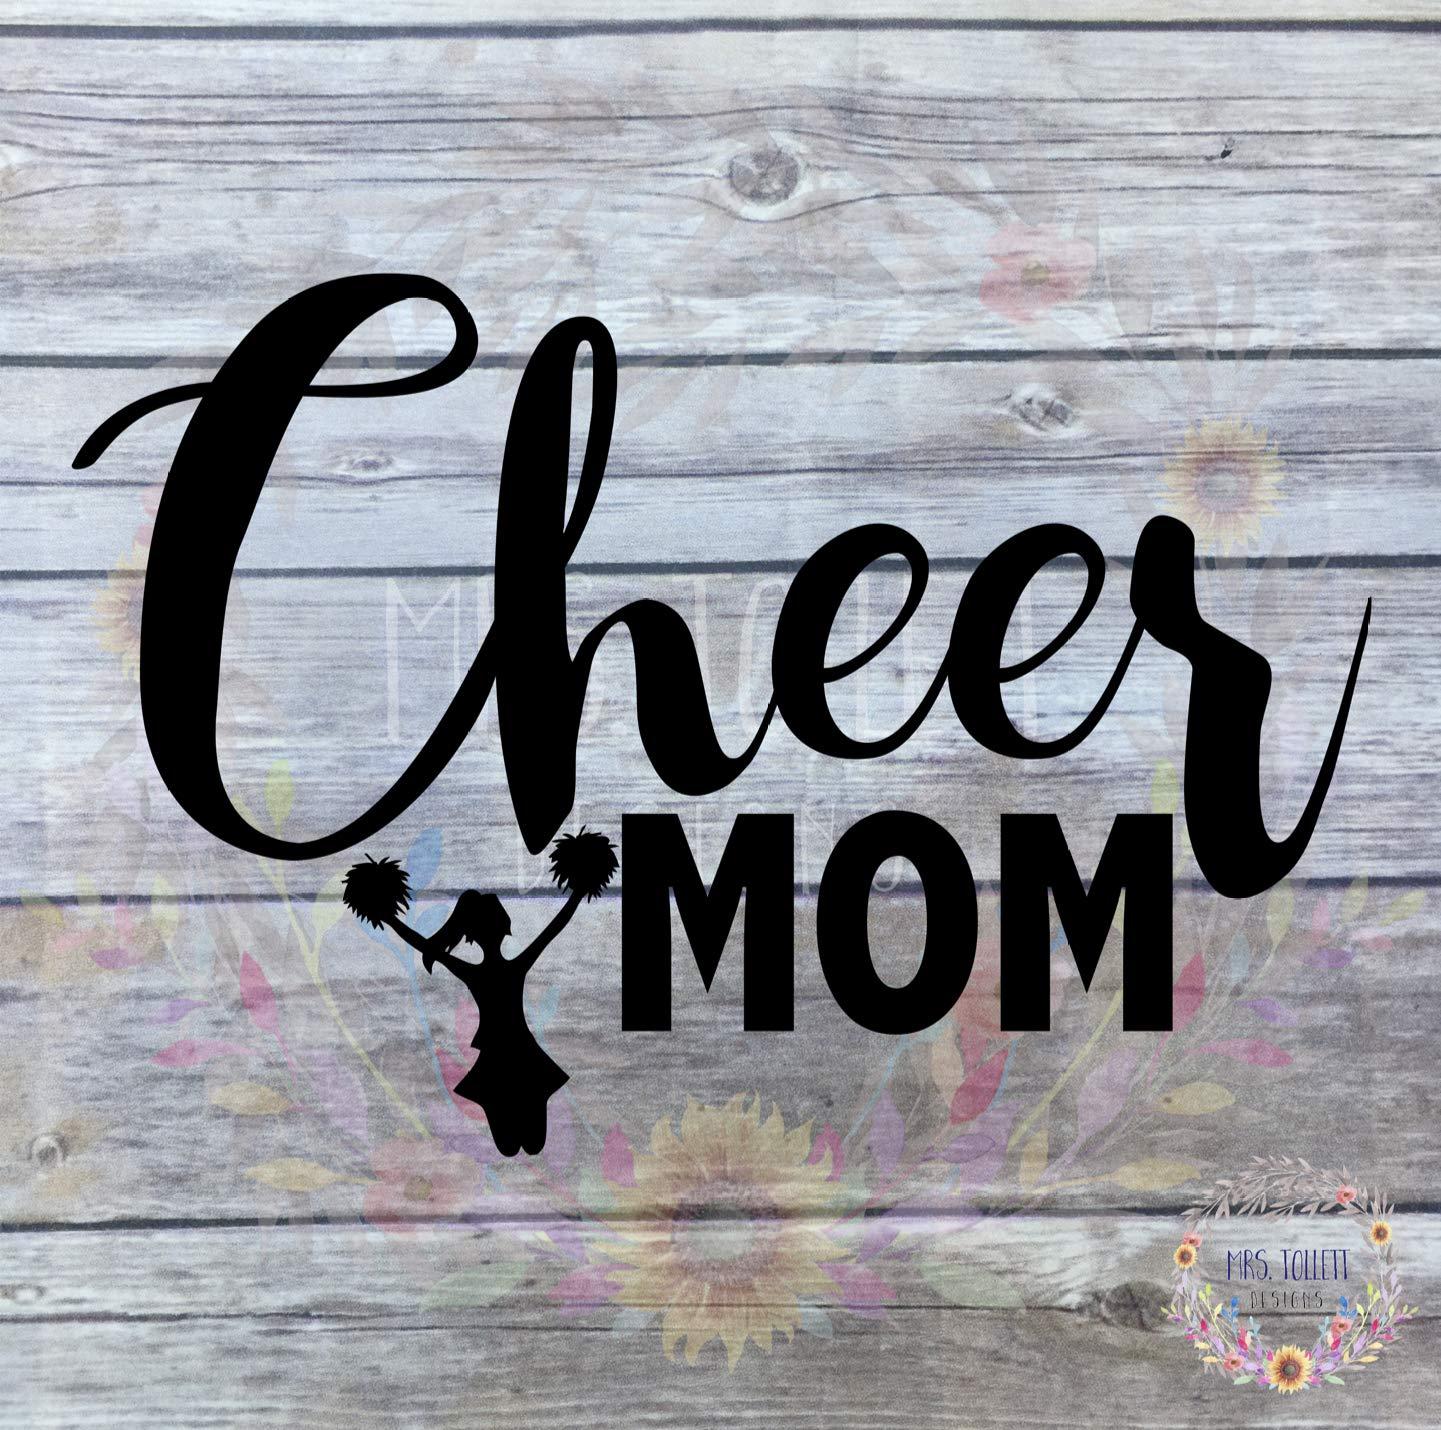 Cheerleader Mom Car Sticker 7x4.5 ORIGINAL Cheer Mom Decal Color Options